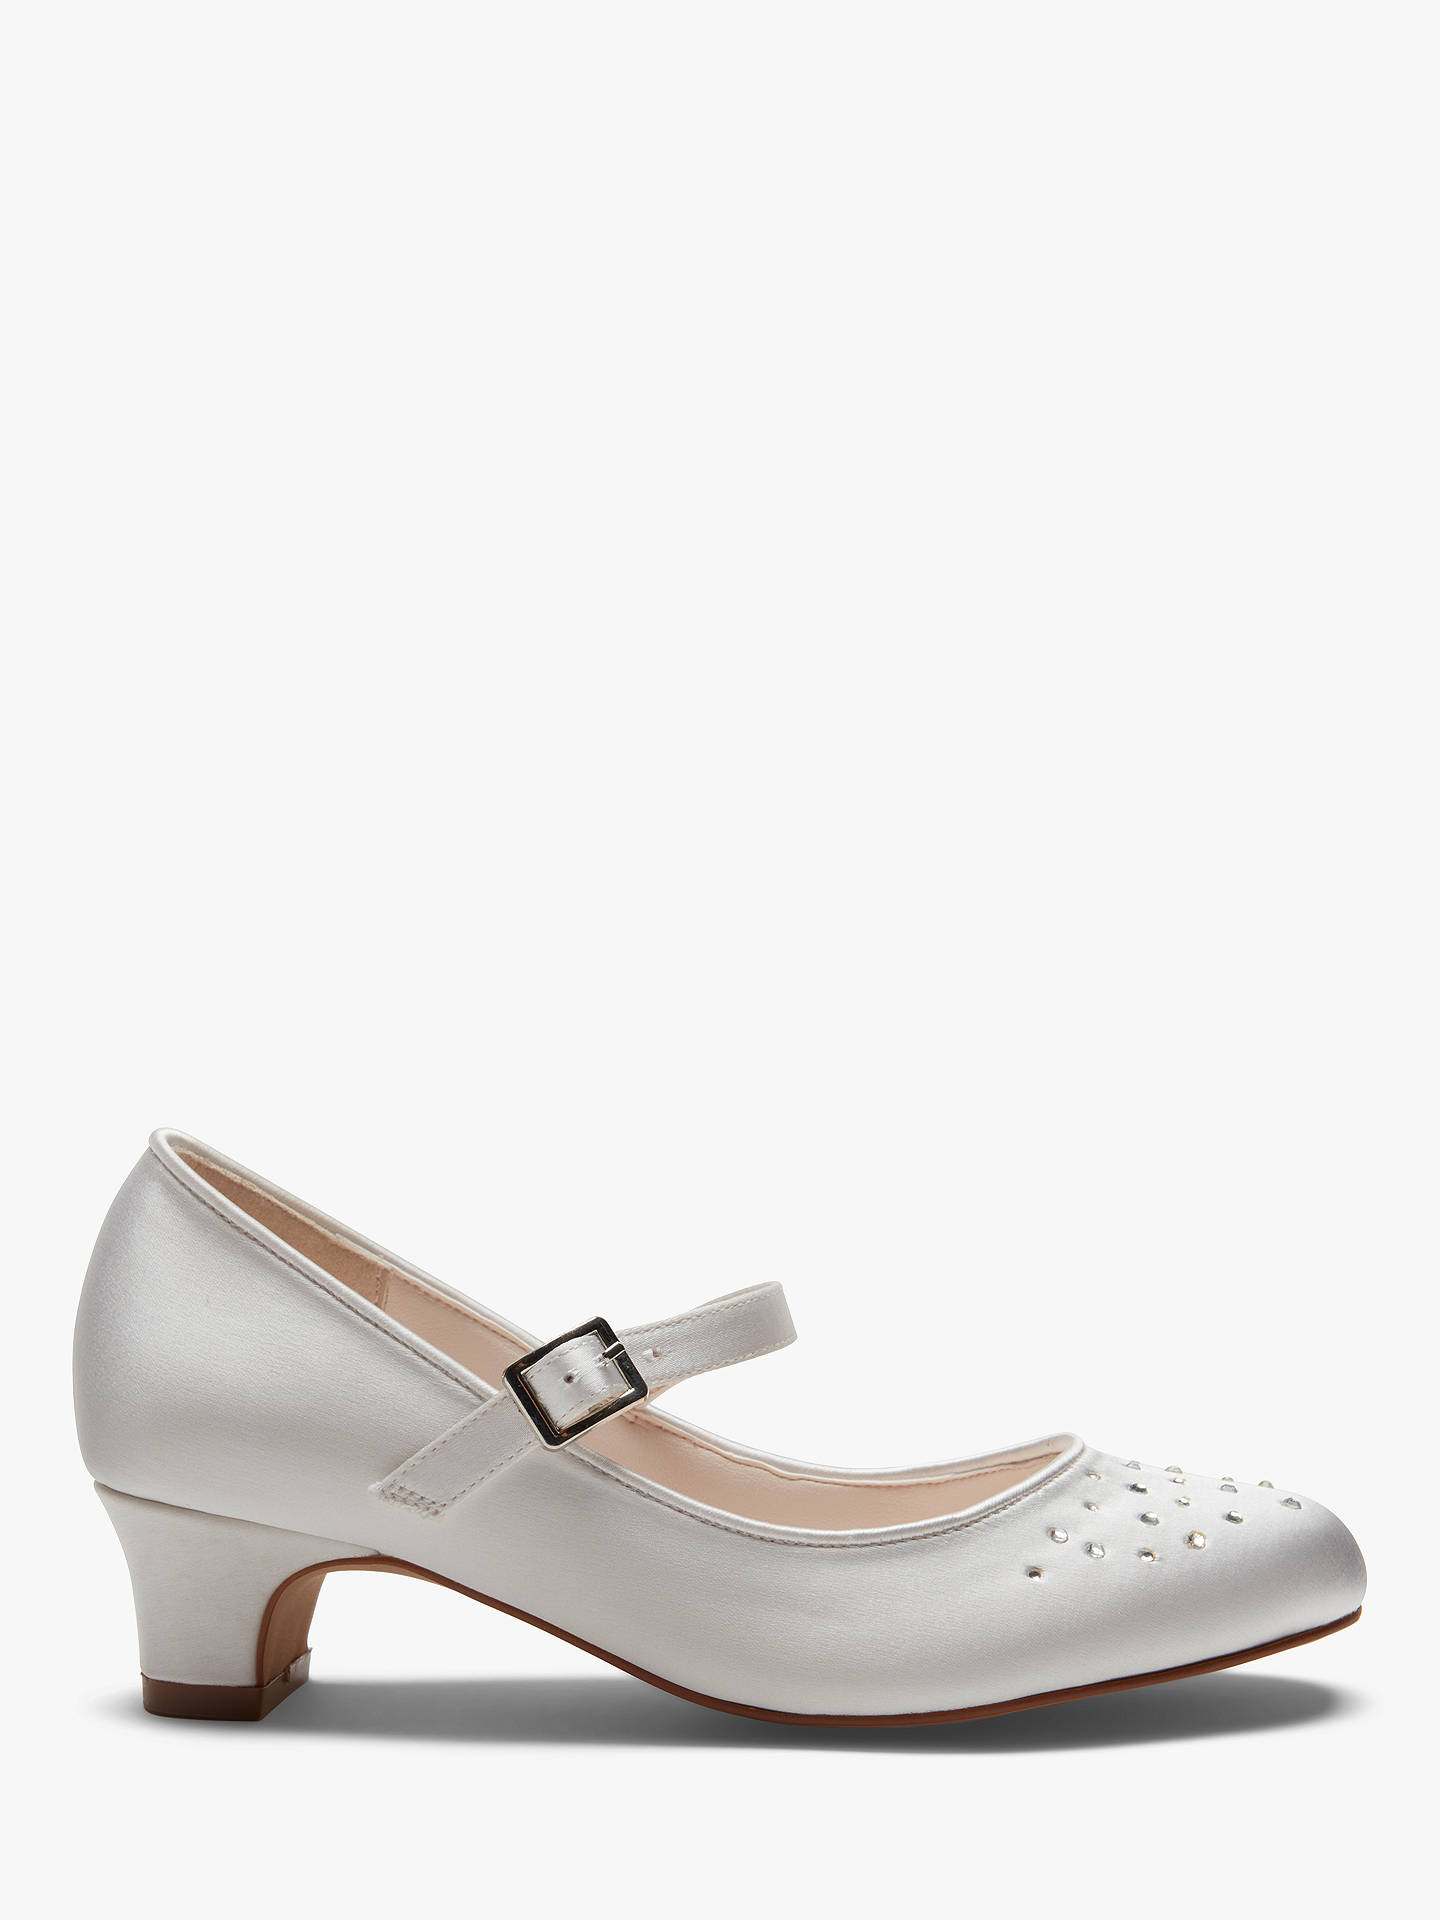 d13c48fee8e Rainbow Club Verity Bridesmaids' Shoes at John Lewis & Partners